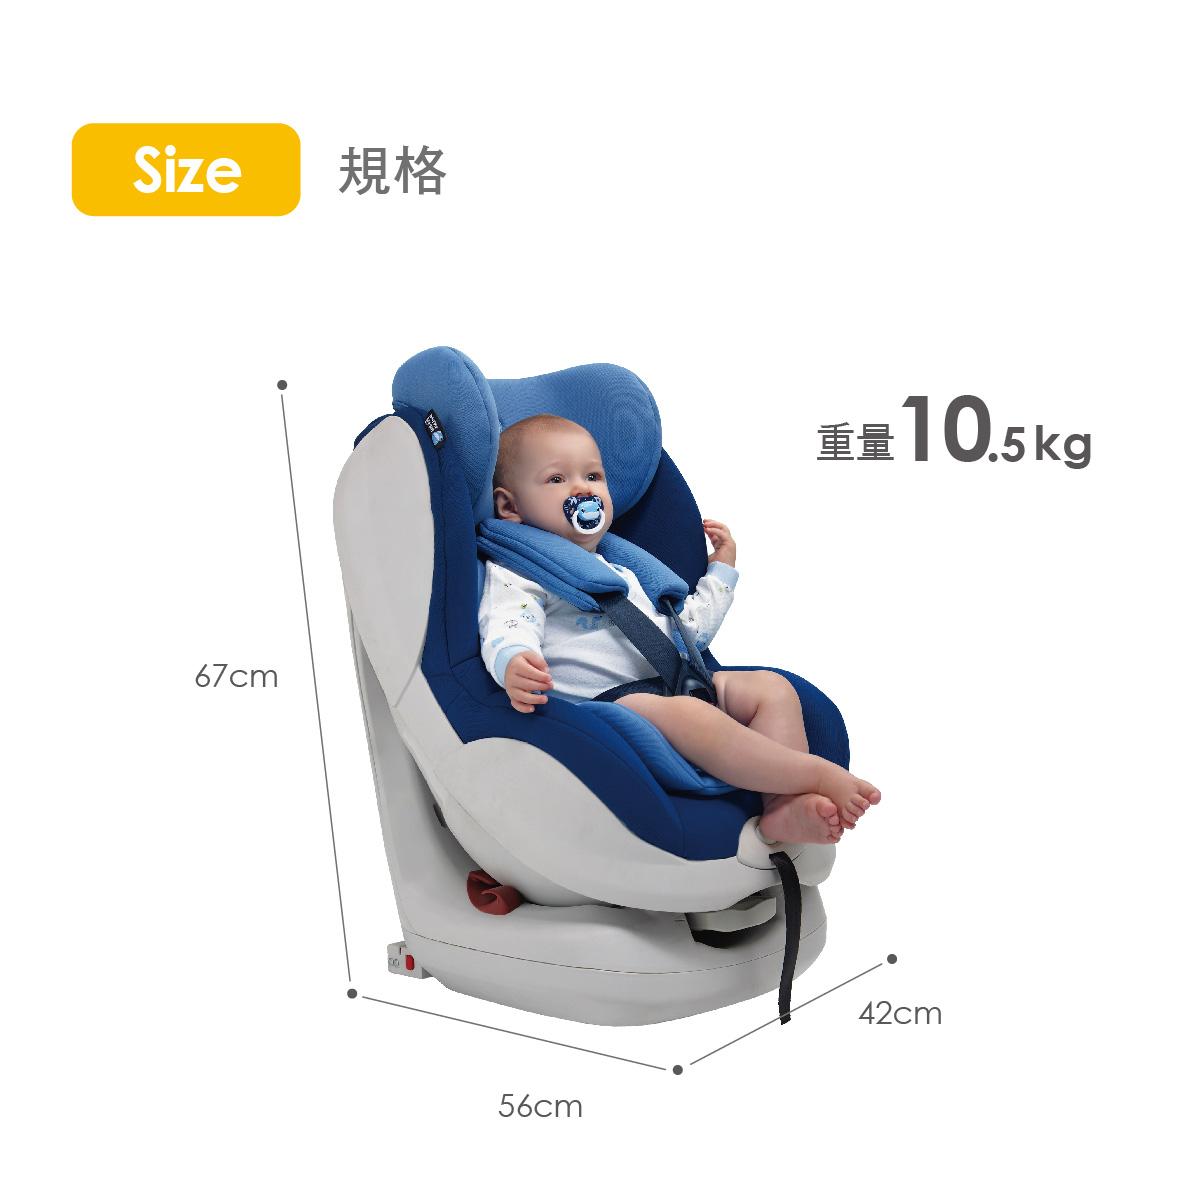 proimages/Tip_Accessories_Series/safety_seat/6039/6039_EDM_1200x1200-3-07.jpg